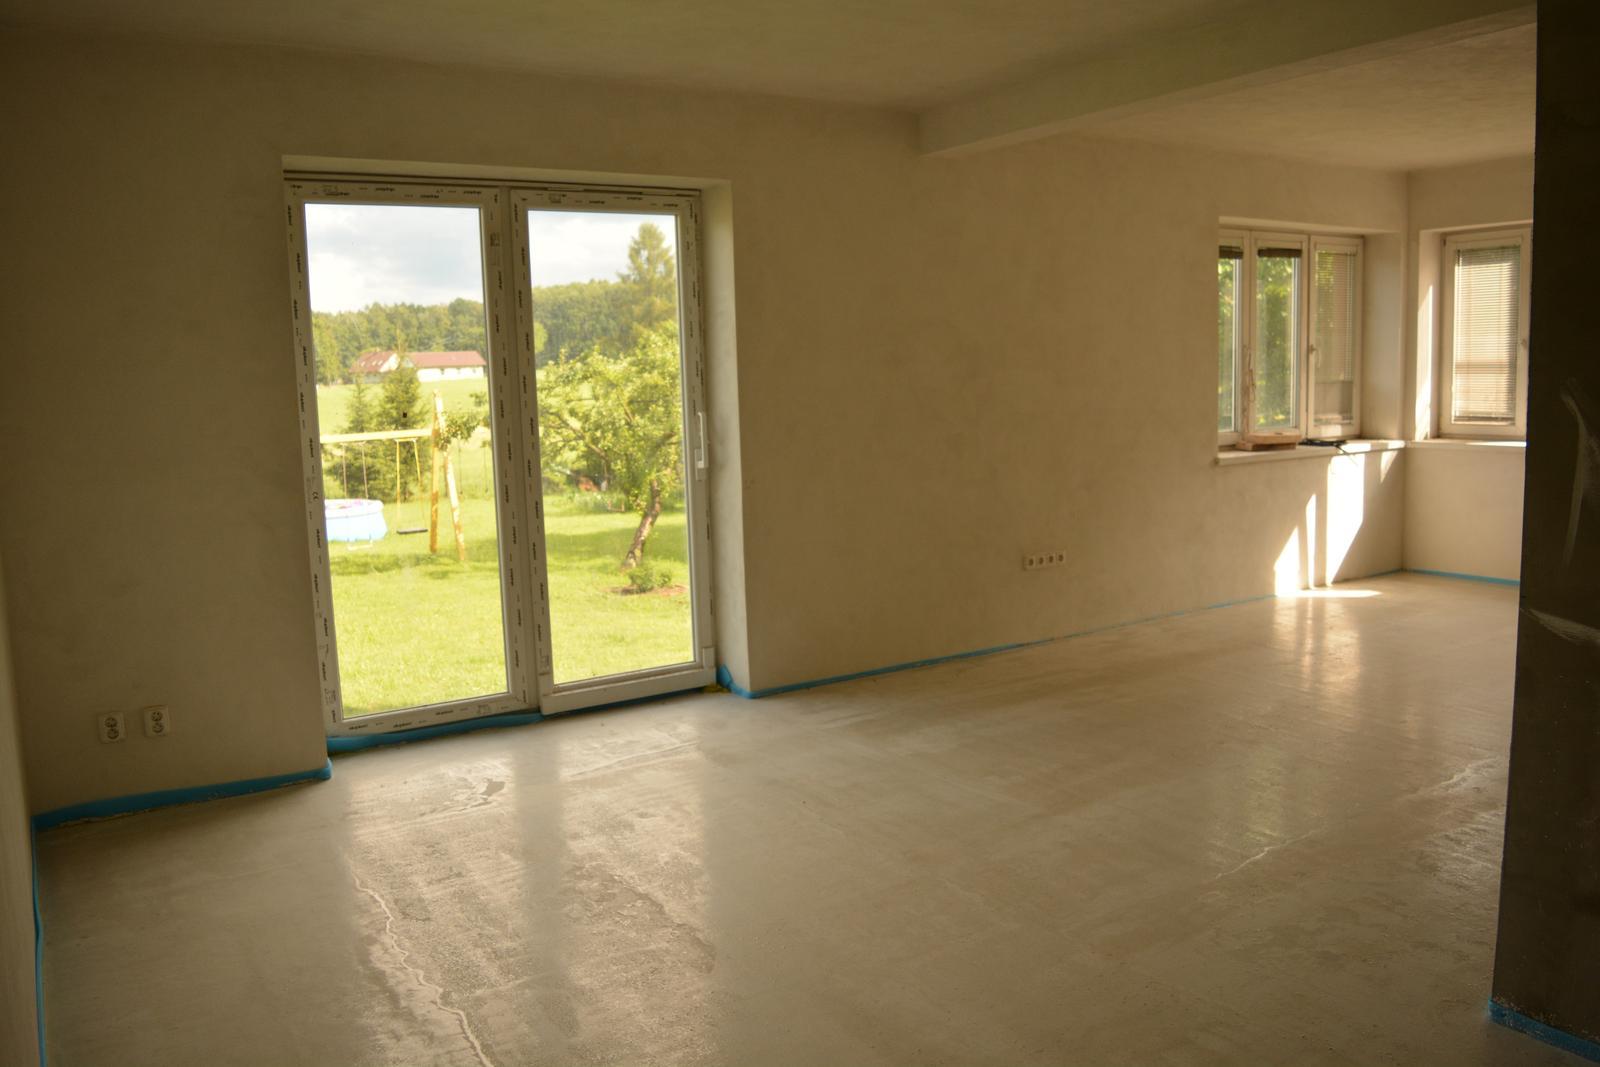 Náš nový domov ... - Obrázek č. 75